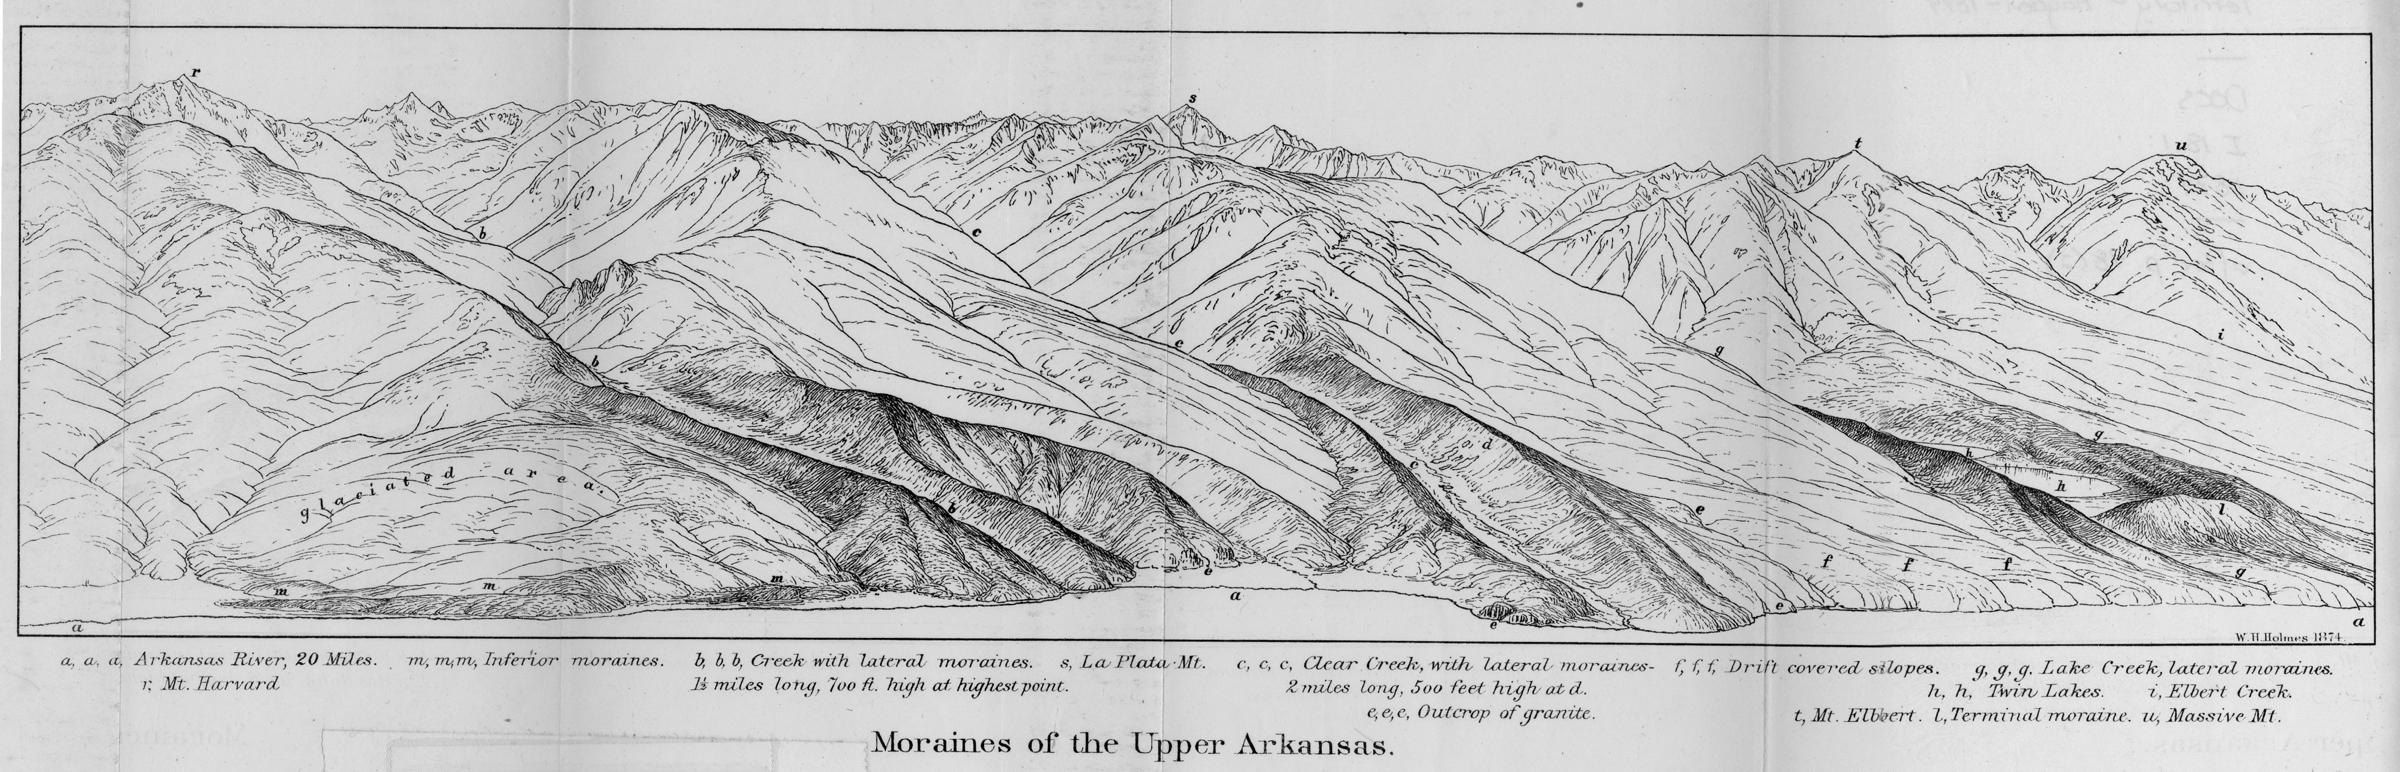 Hayden's Landscapes Revisited - Sawatch/Clear Creek